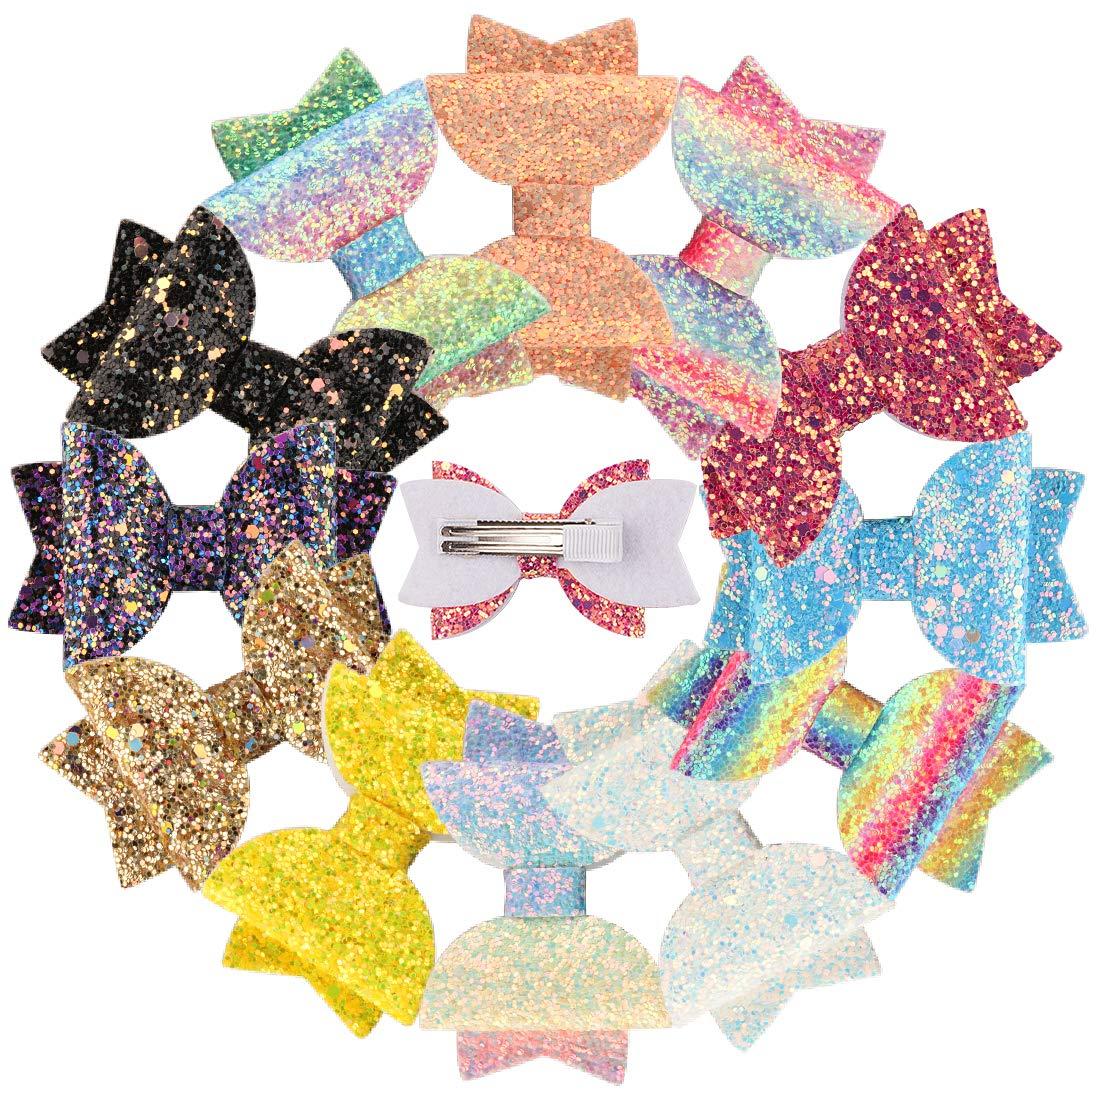 XIMA 12pcs Glitter Sparkly Bows Clips for Girls Hair Pin Rainbow Hair Bows for Hair Accessoires (12pcs-Glitter Rainbow bow clip)